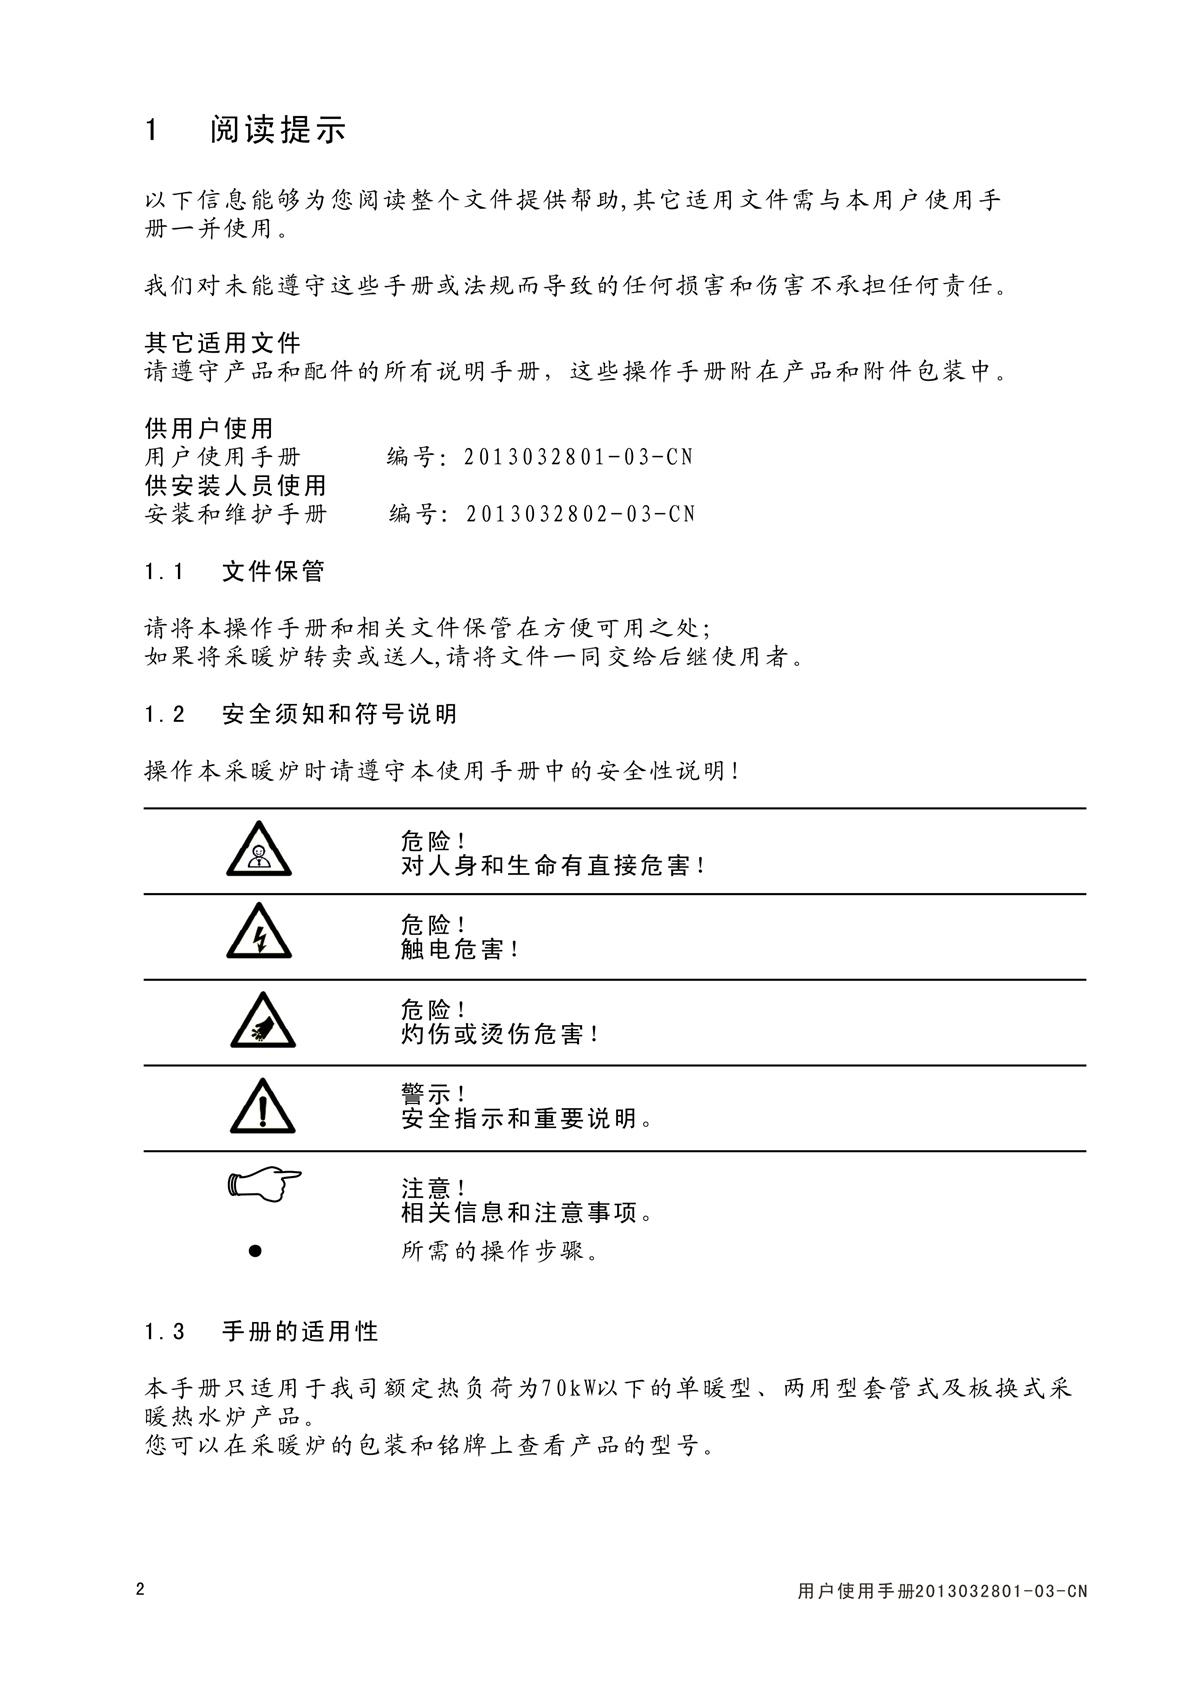 ES16A系列-用户使用手册-3_01.jpg